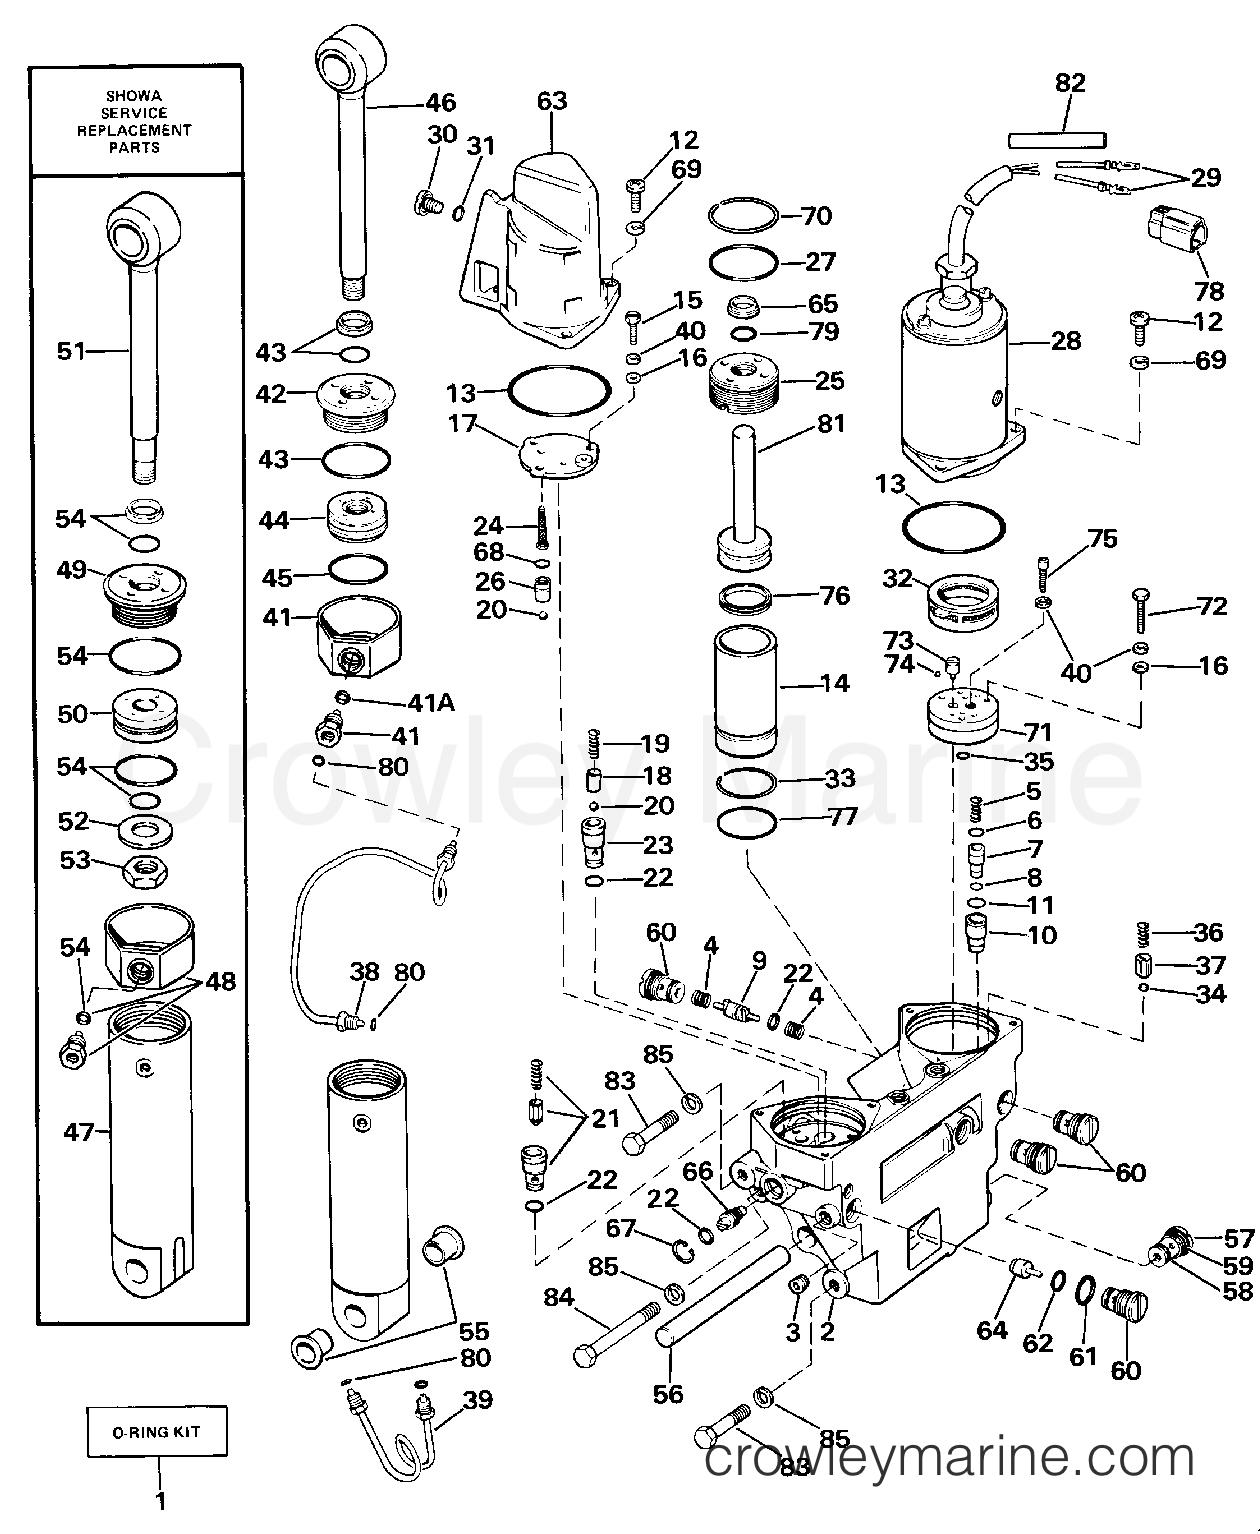 power trim tilt hydraulic assembly 1987 evinrude outboards 90 rh crowleymarine com Fisher Valve Manual Manual Valve Body